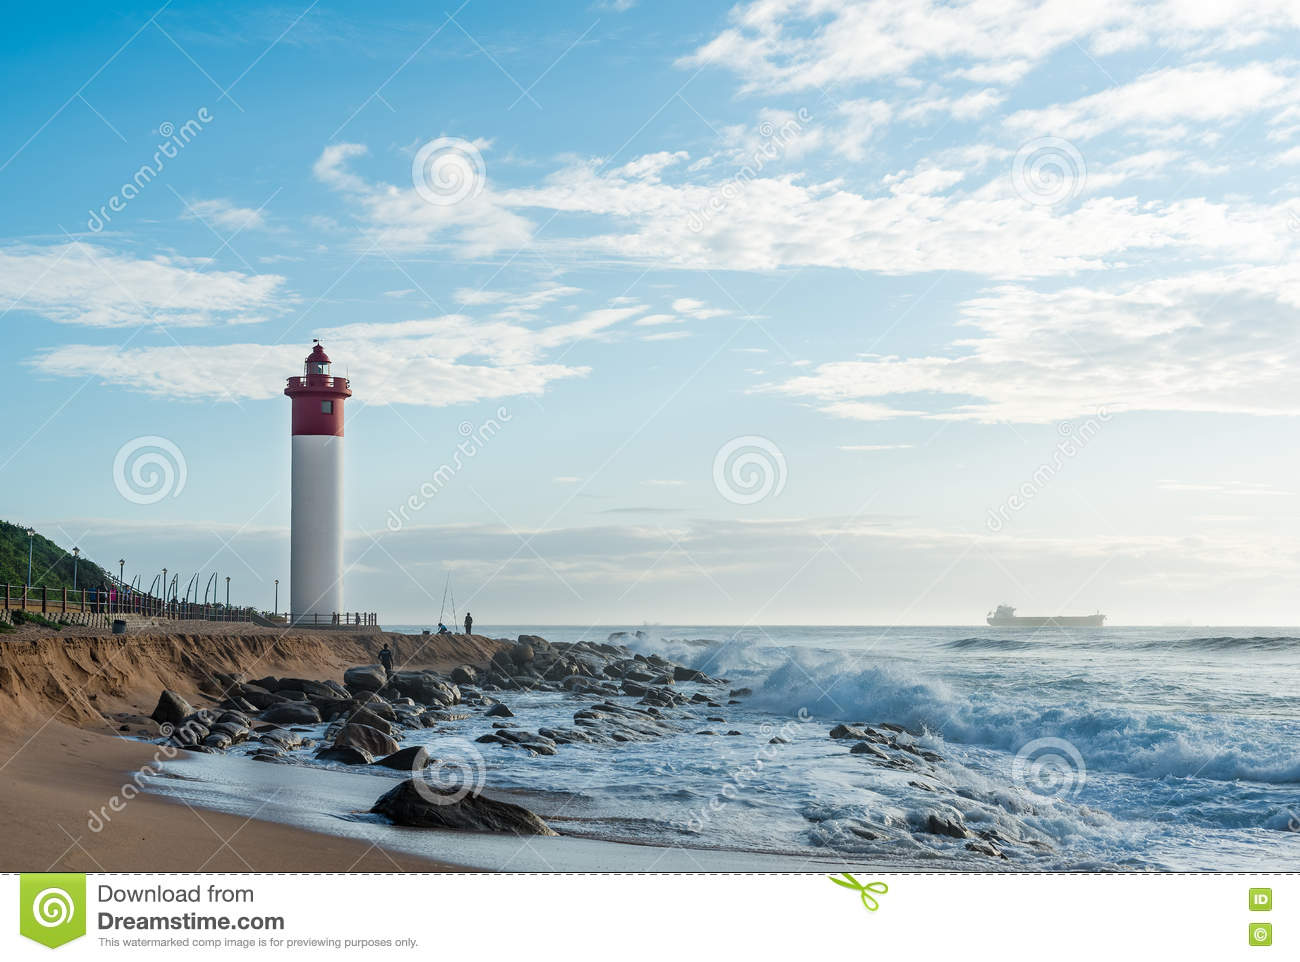 Umhlanga Rocks Lighthouse With Fishermen And People Walking On The.